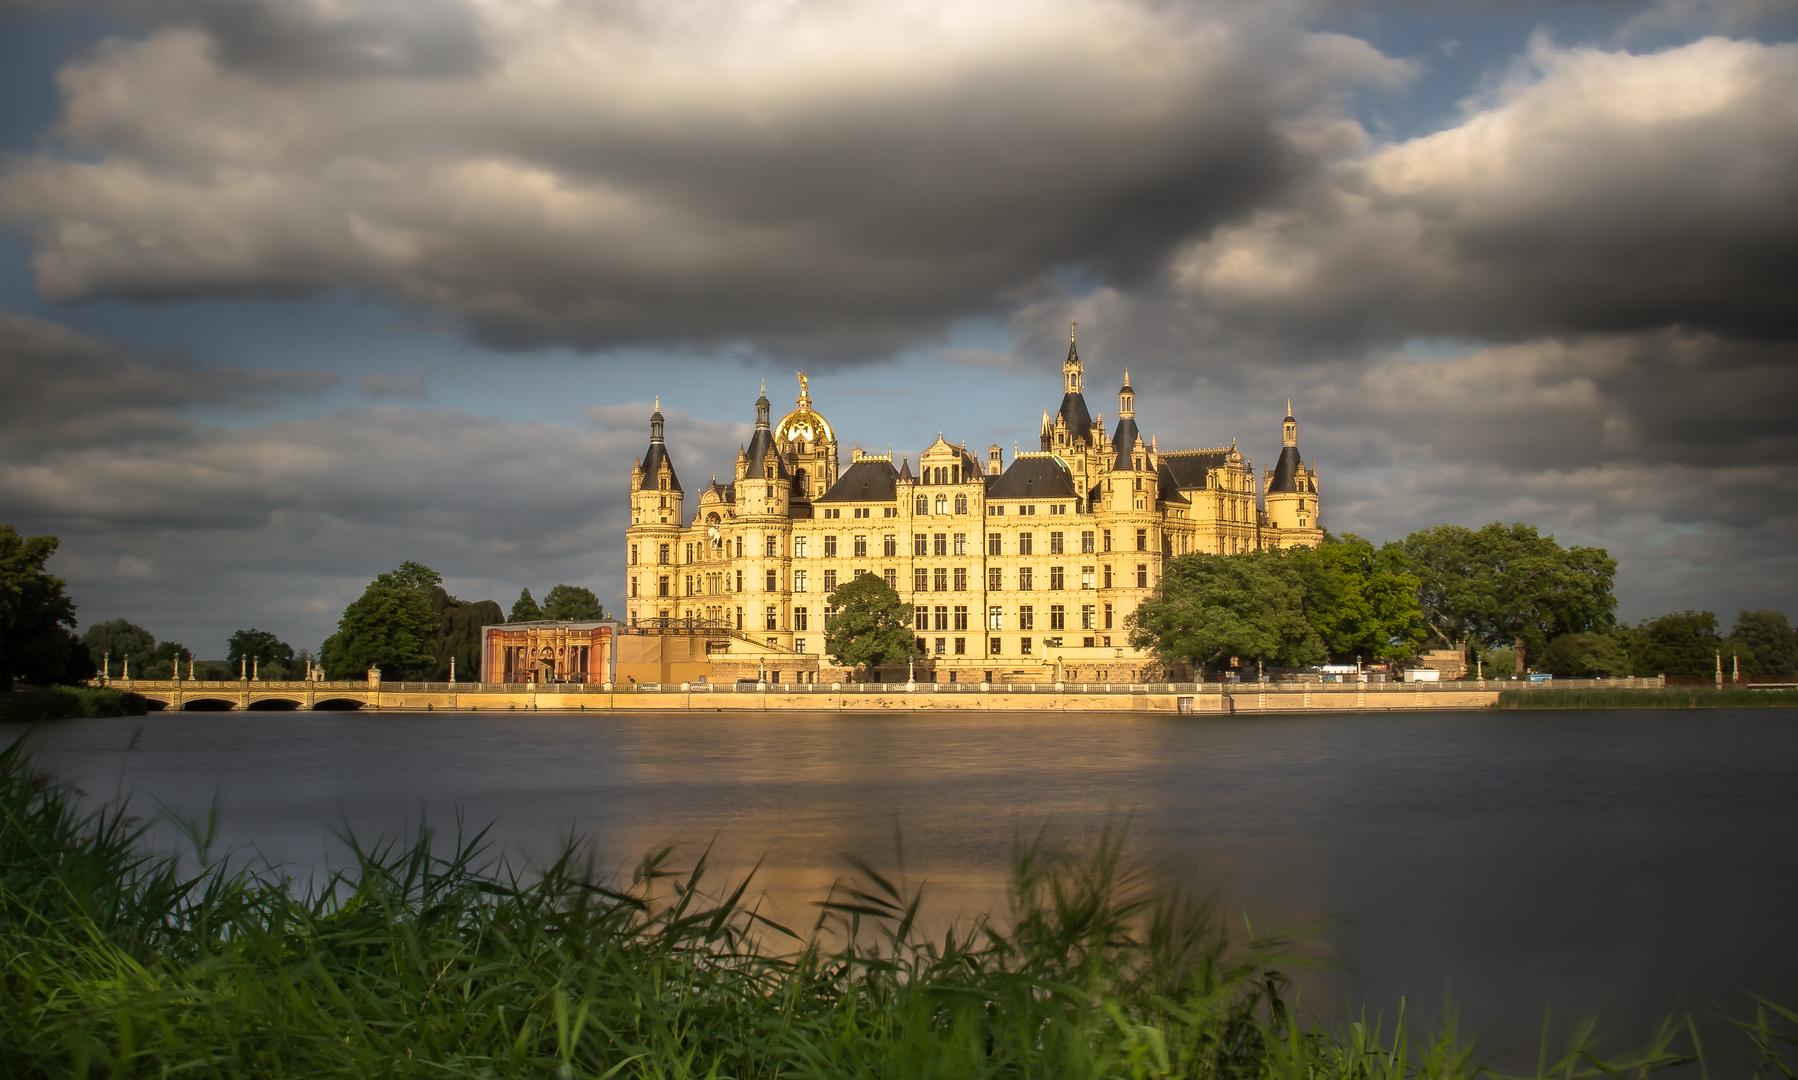 ...Das Schweriner Schloss